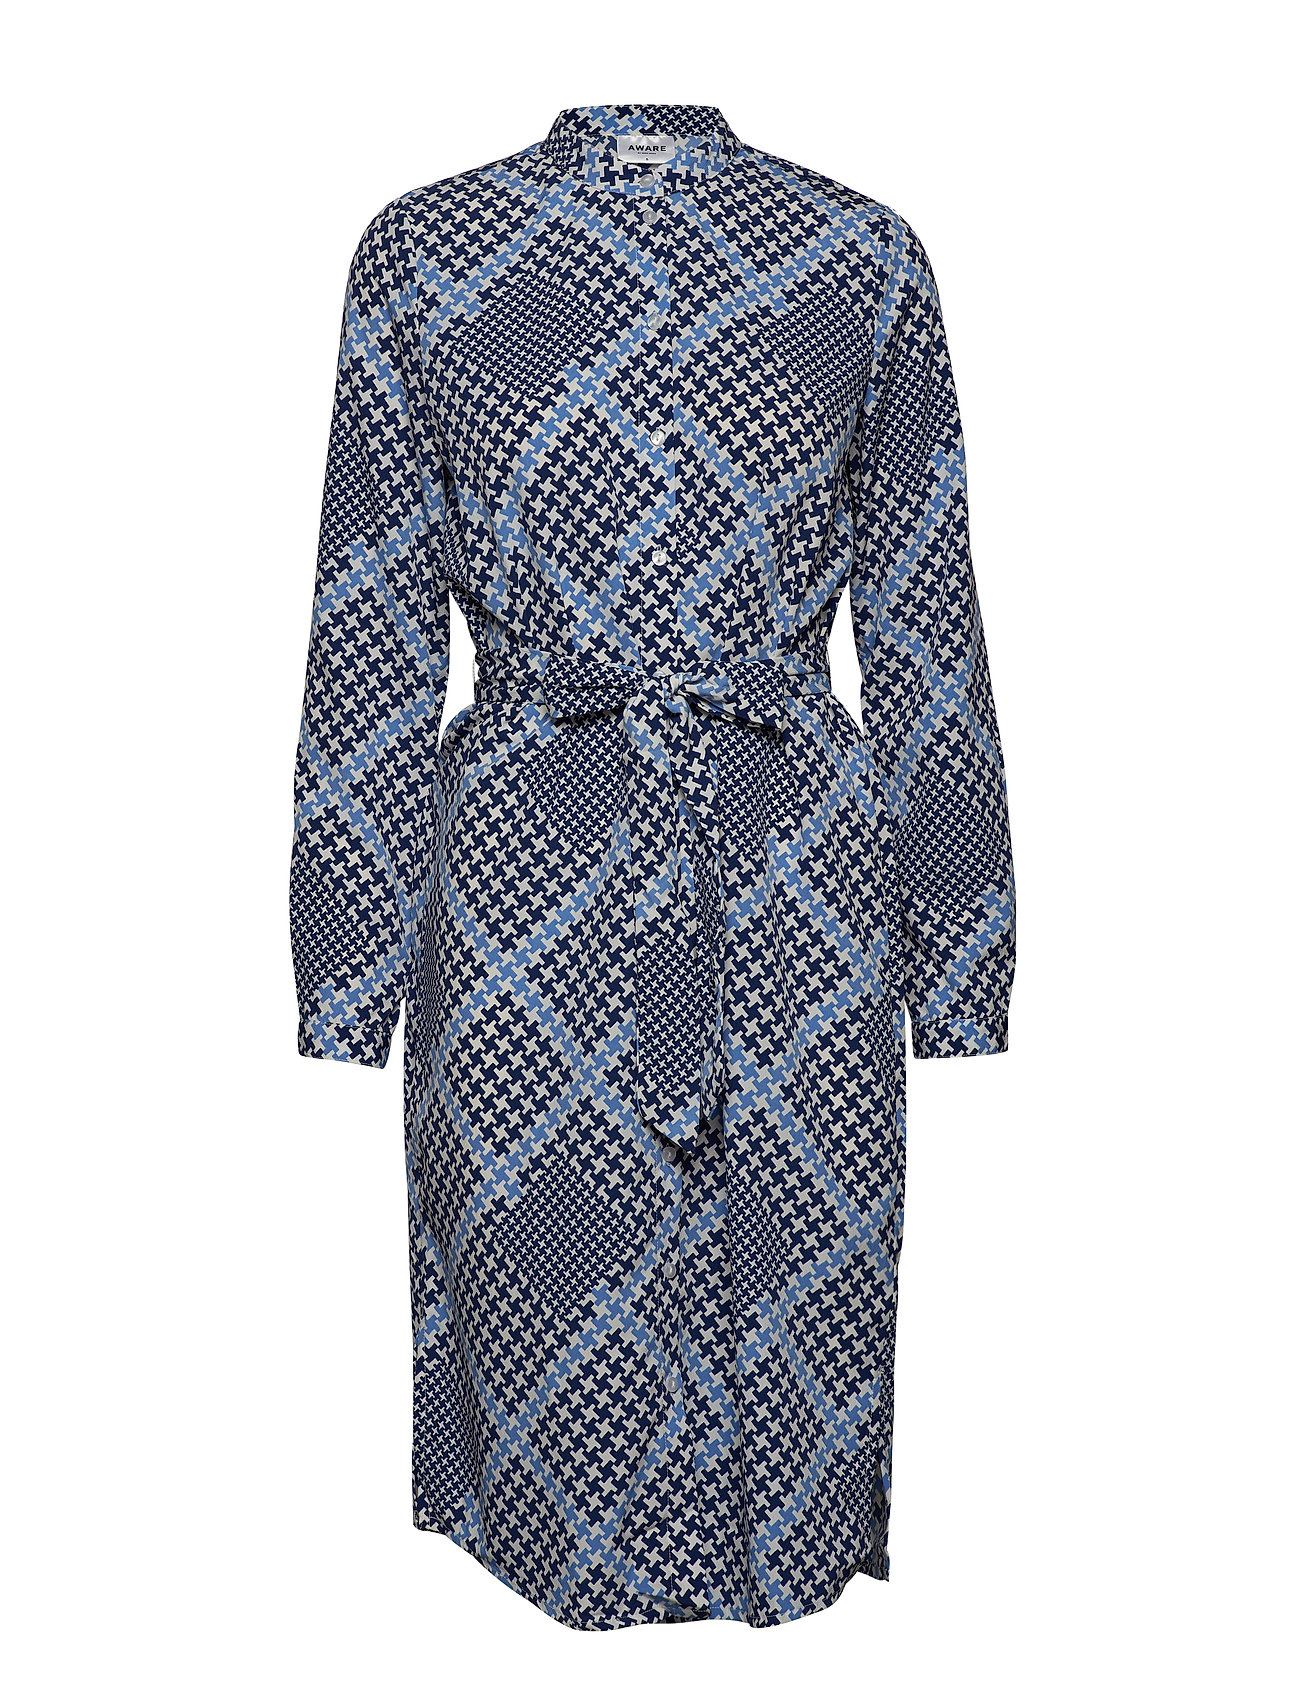 c4695174 Vmandratx Ls Shirt Dress Vma (Birch) (194.35 kr) - Vero Moda ...